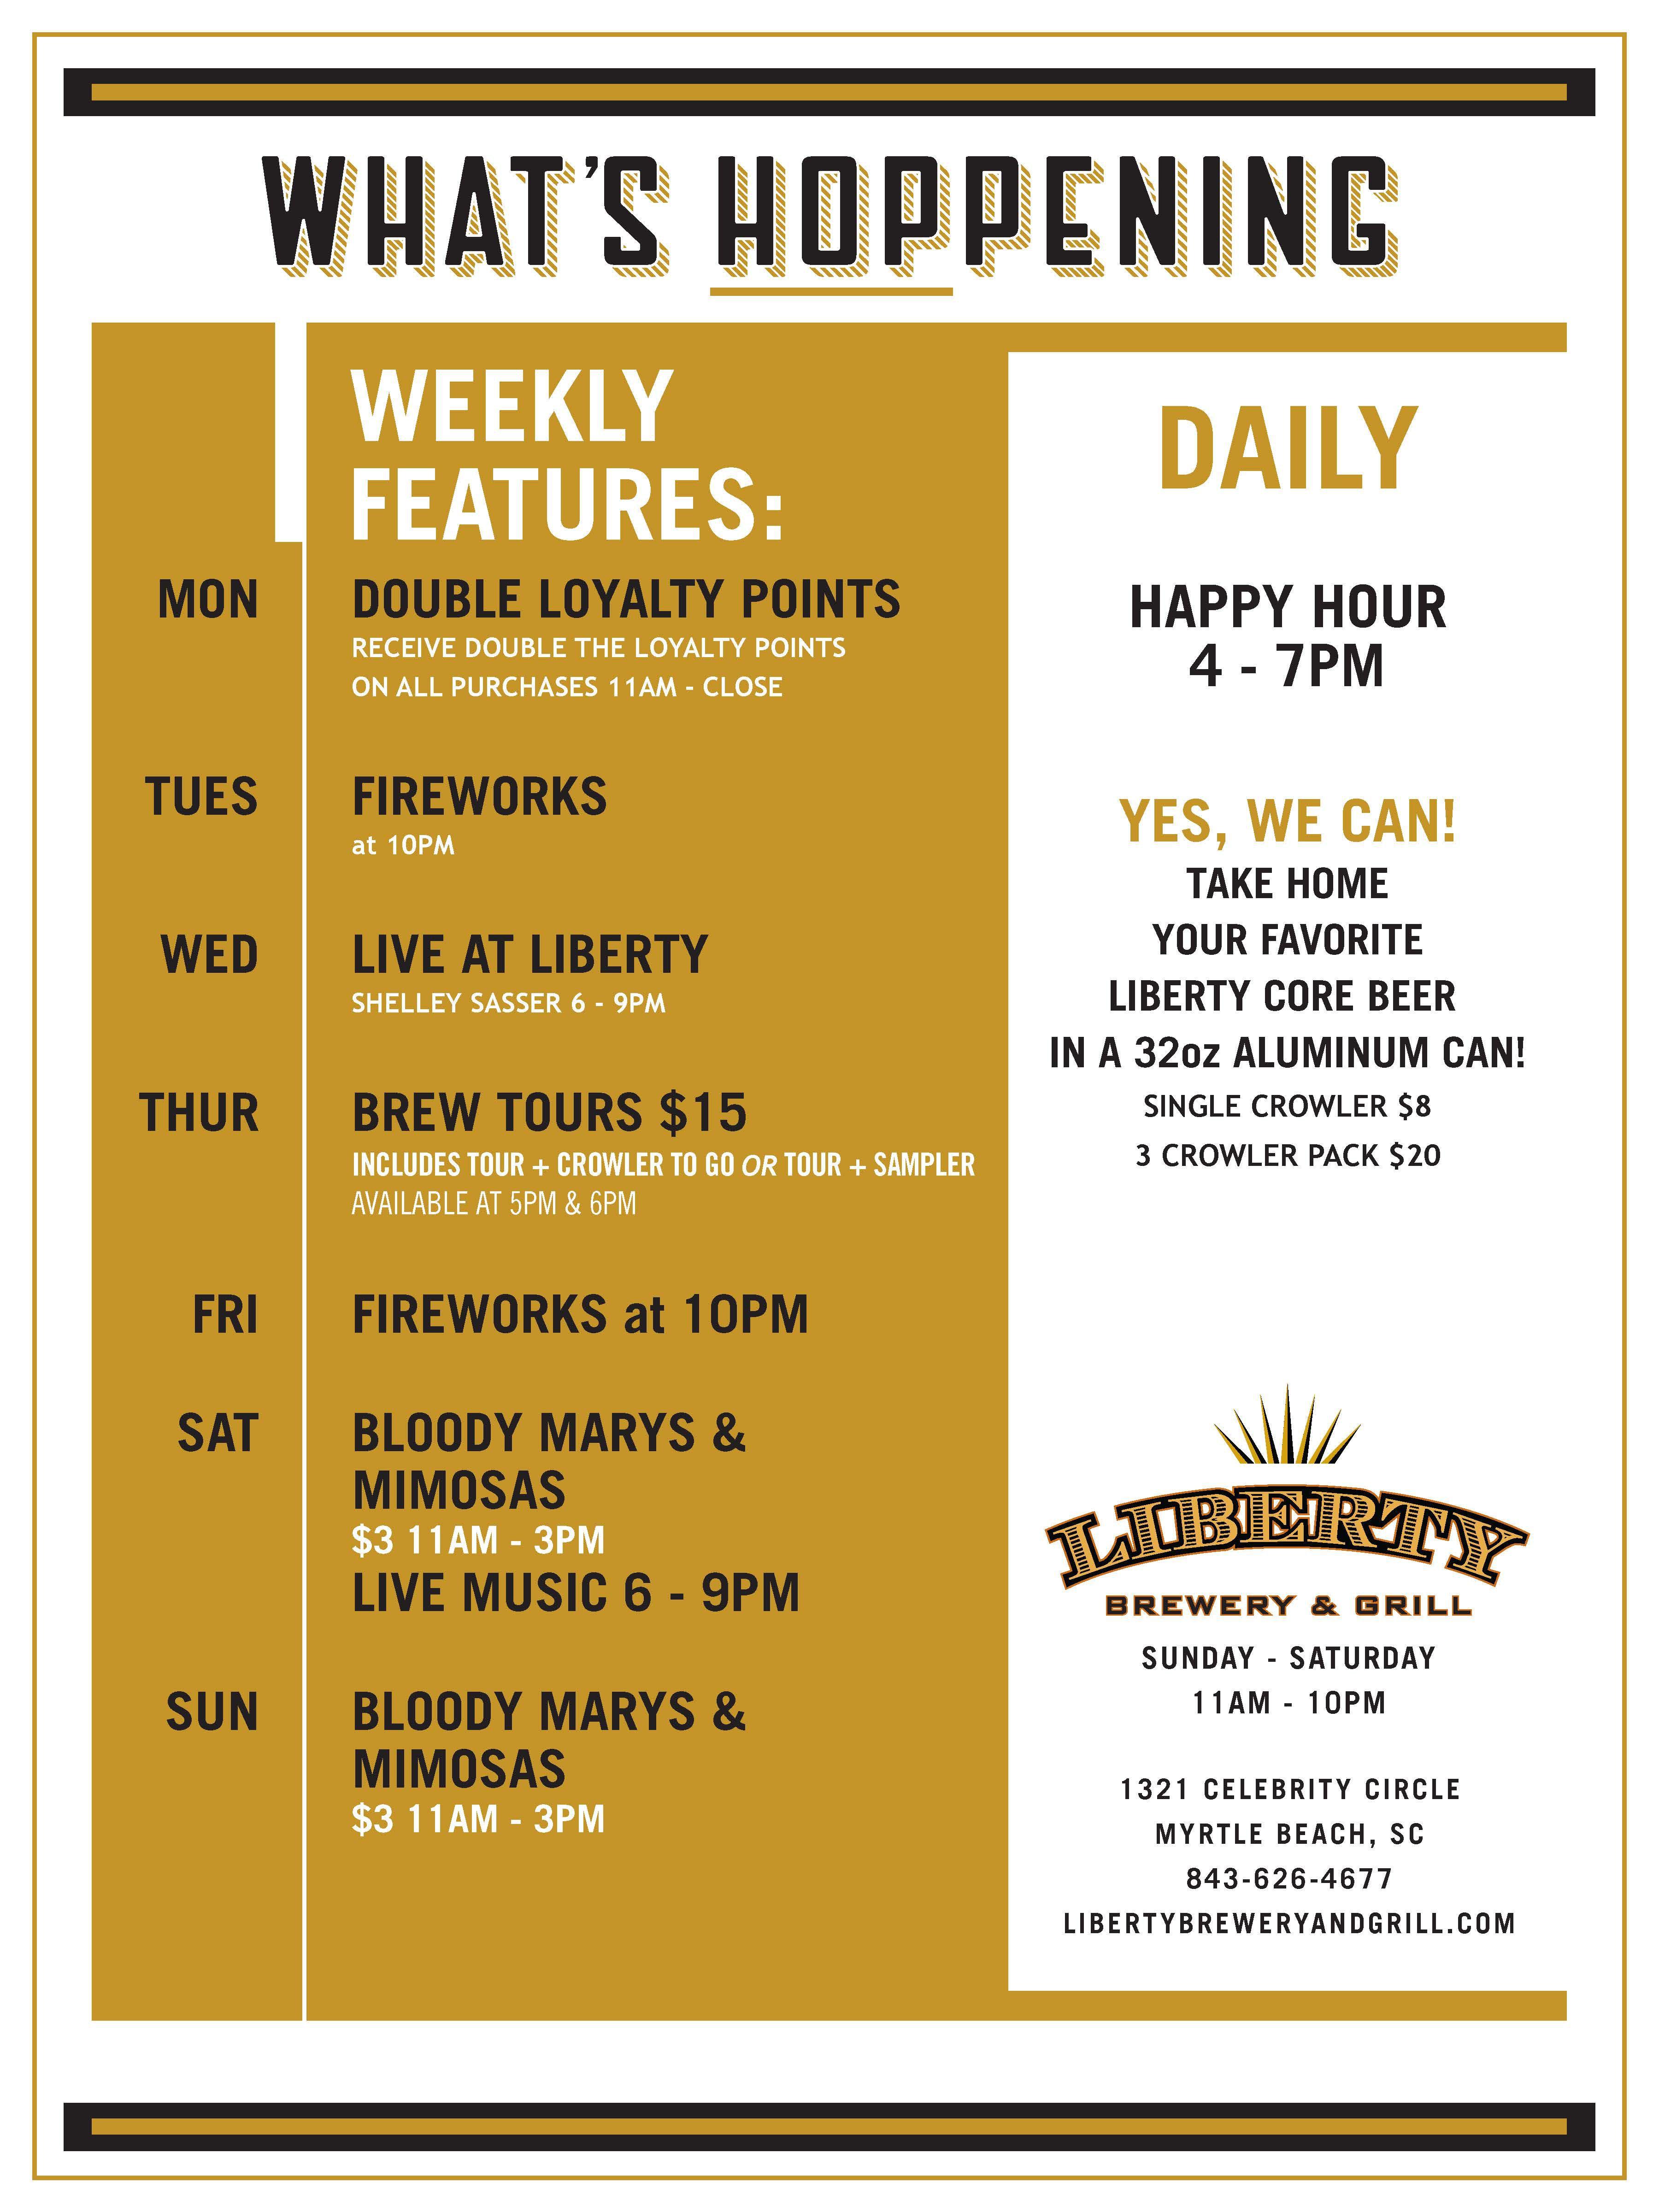 (300) Liberty Brew MB July Calendar.jpg